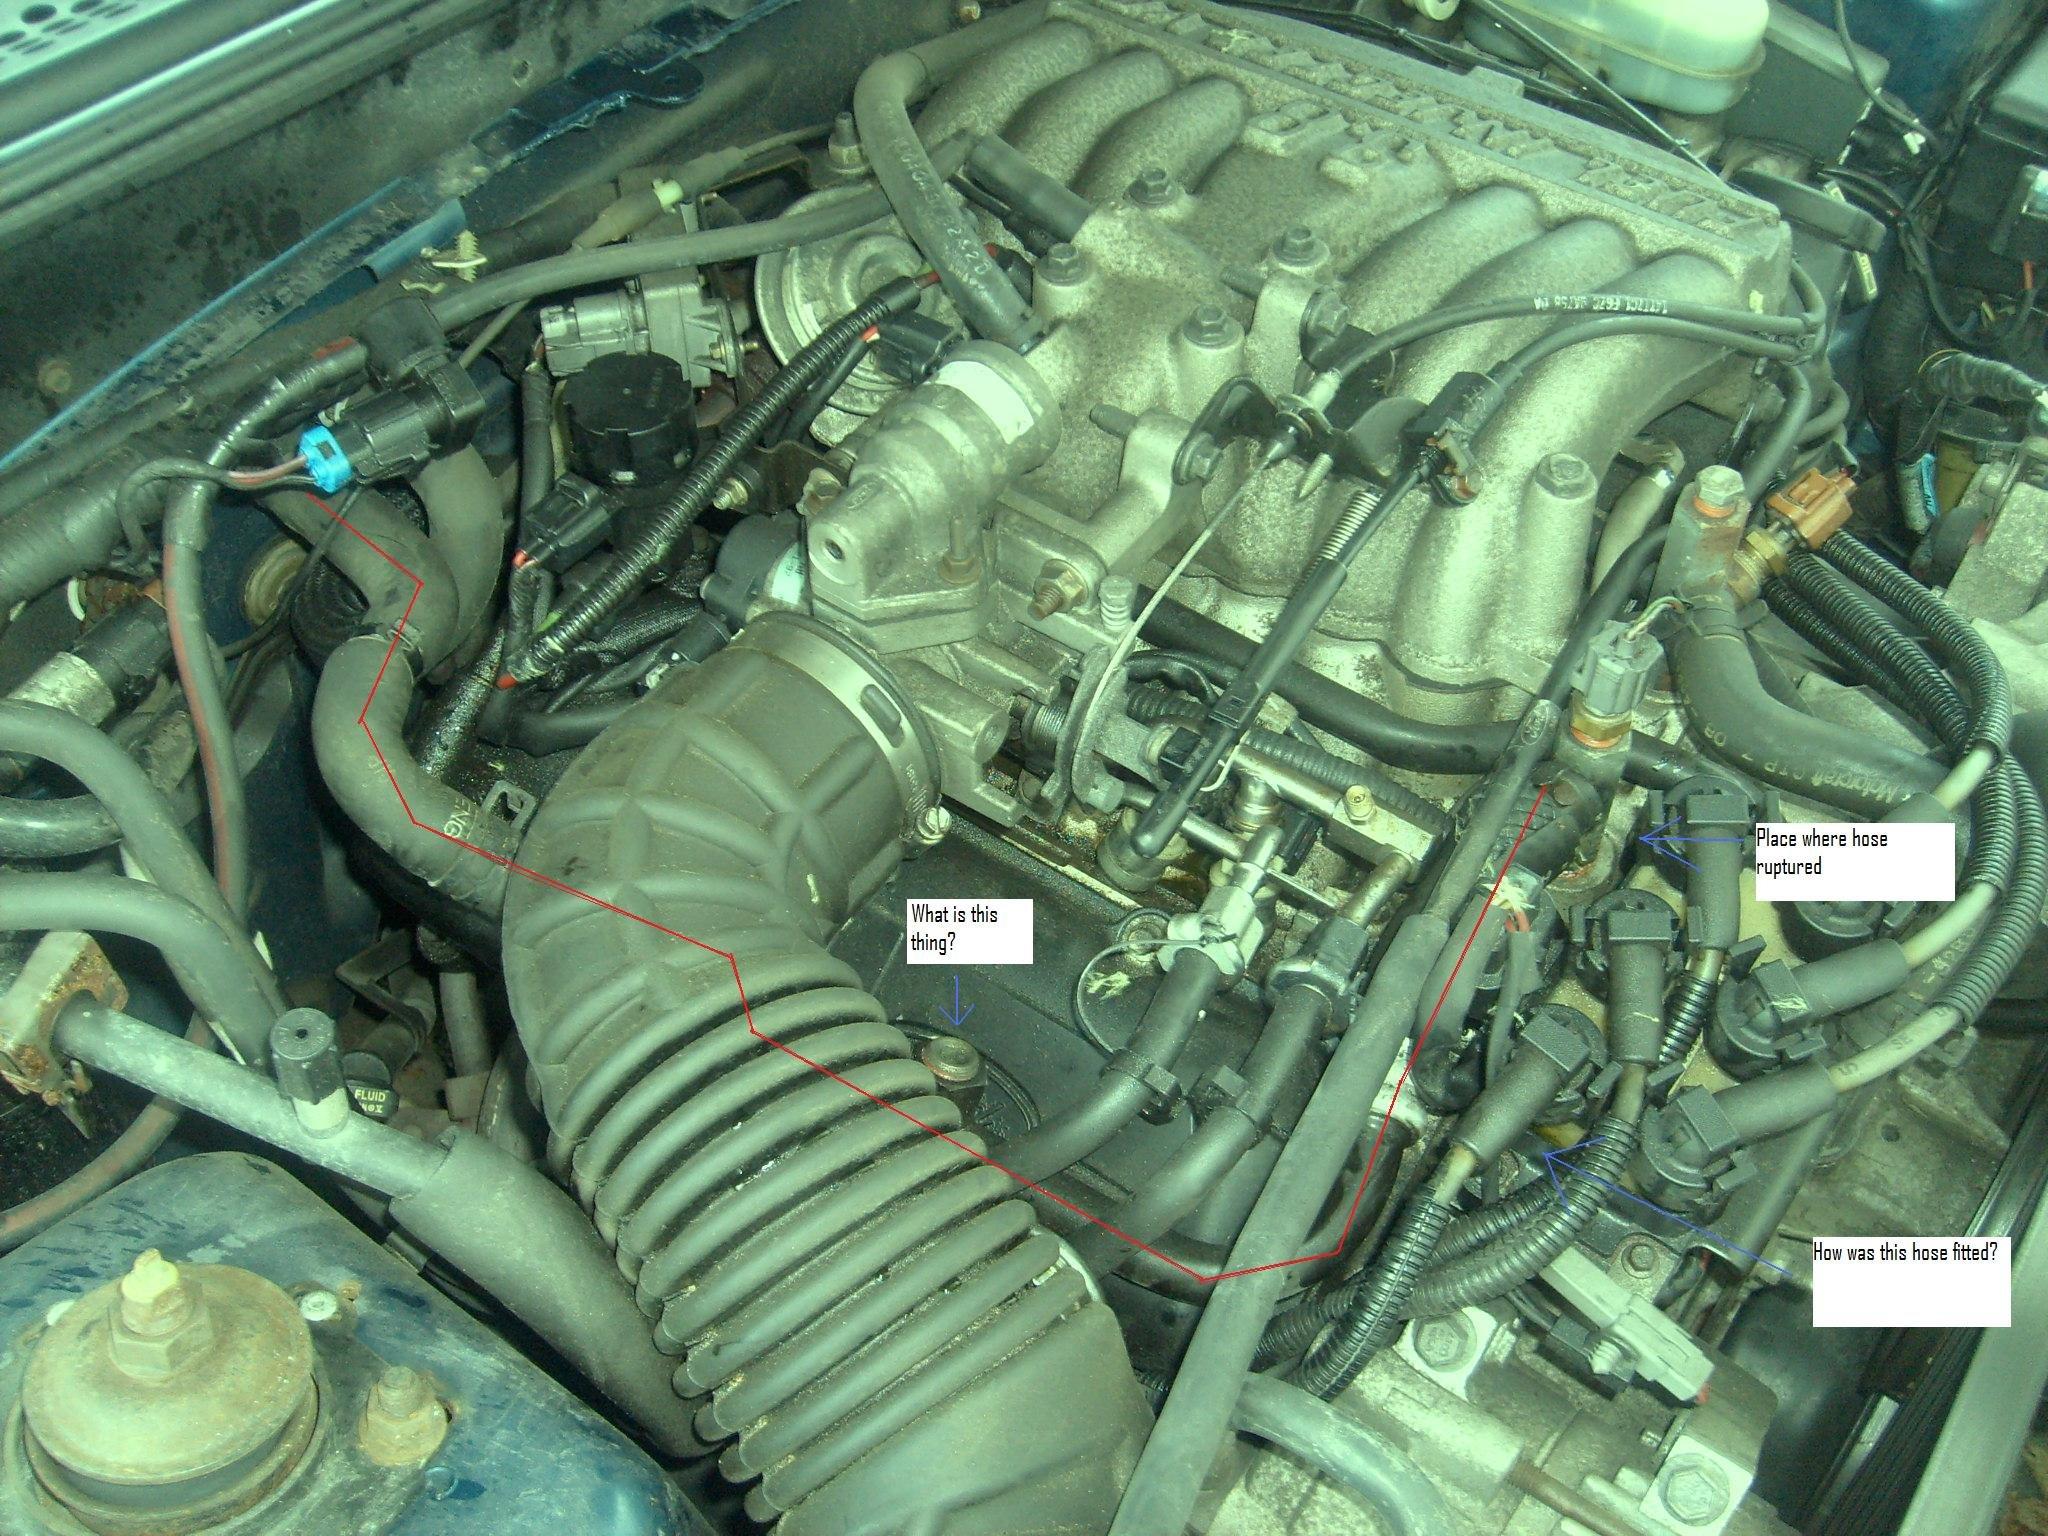 1998 mustang heater hose ruptured ford mustang forum rh allfordmustangs com Chevy Heater Hose Diagram Dodge Caravan Heater Hose Diagram